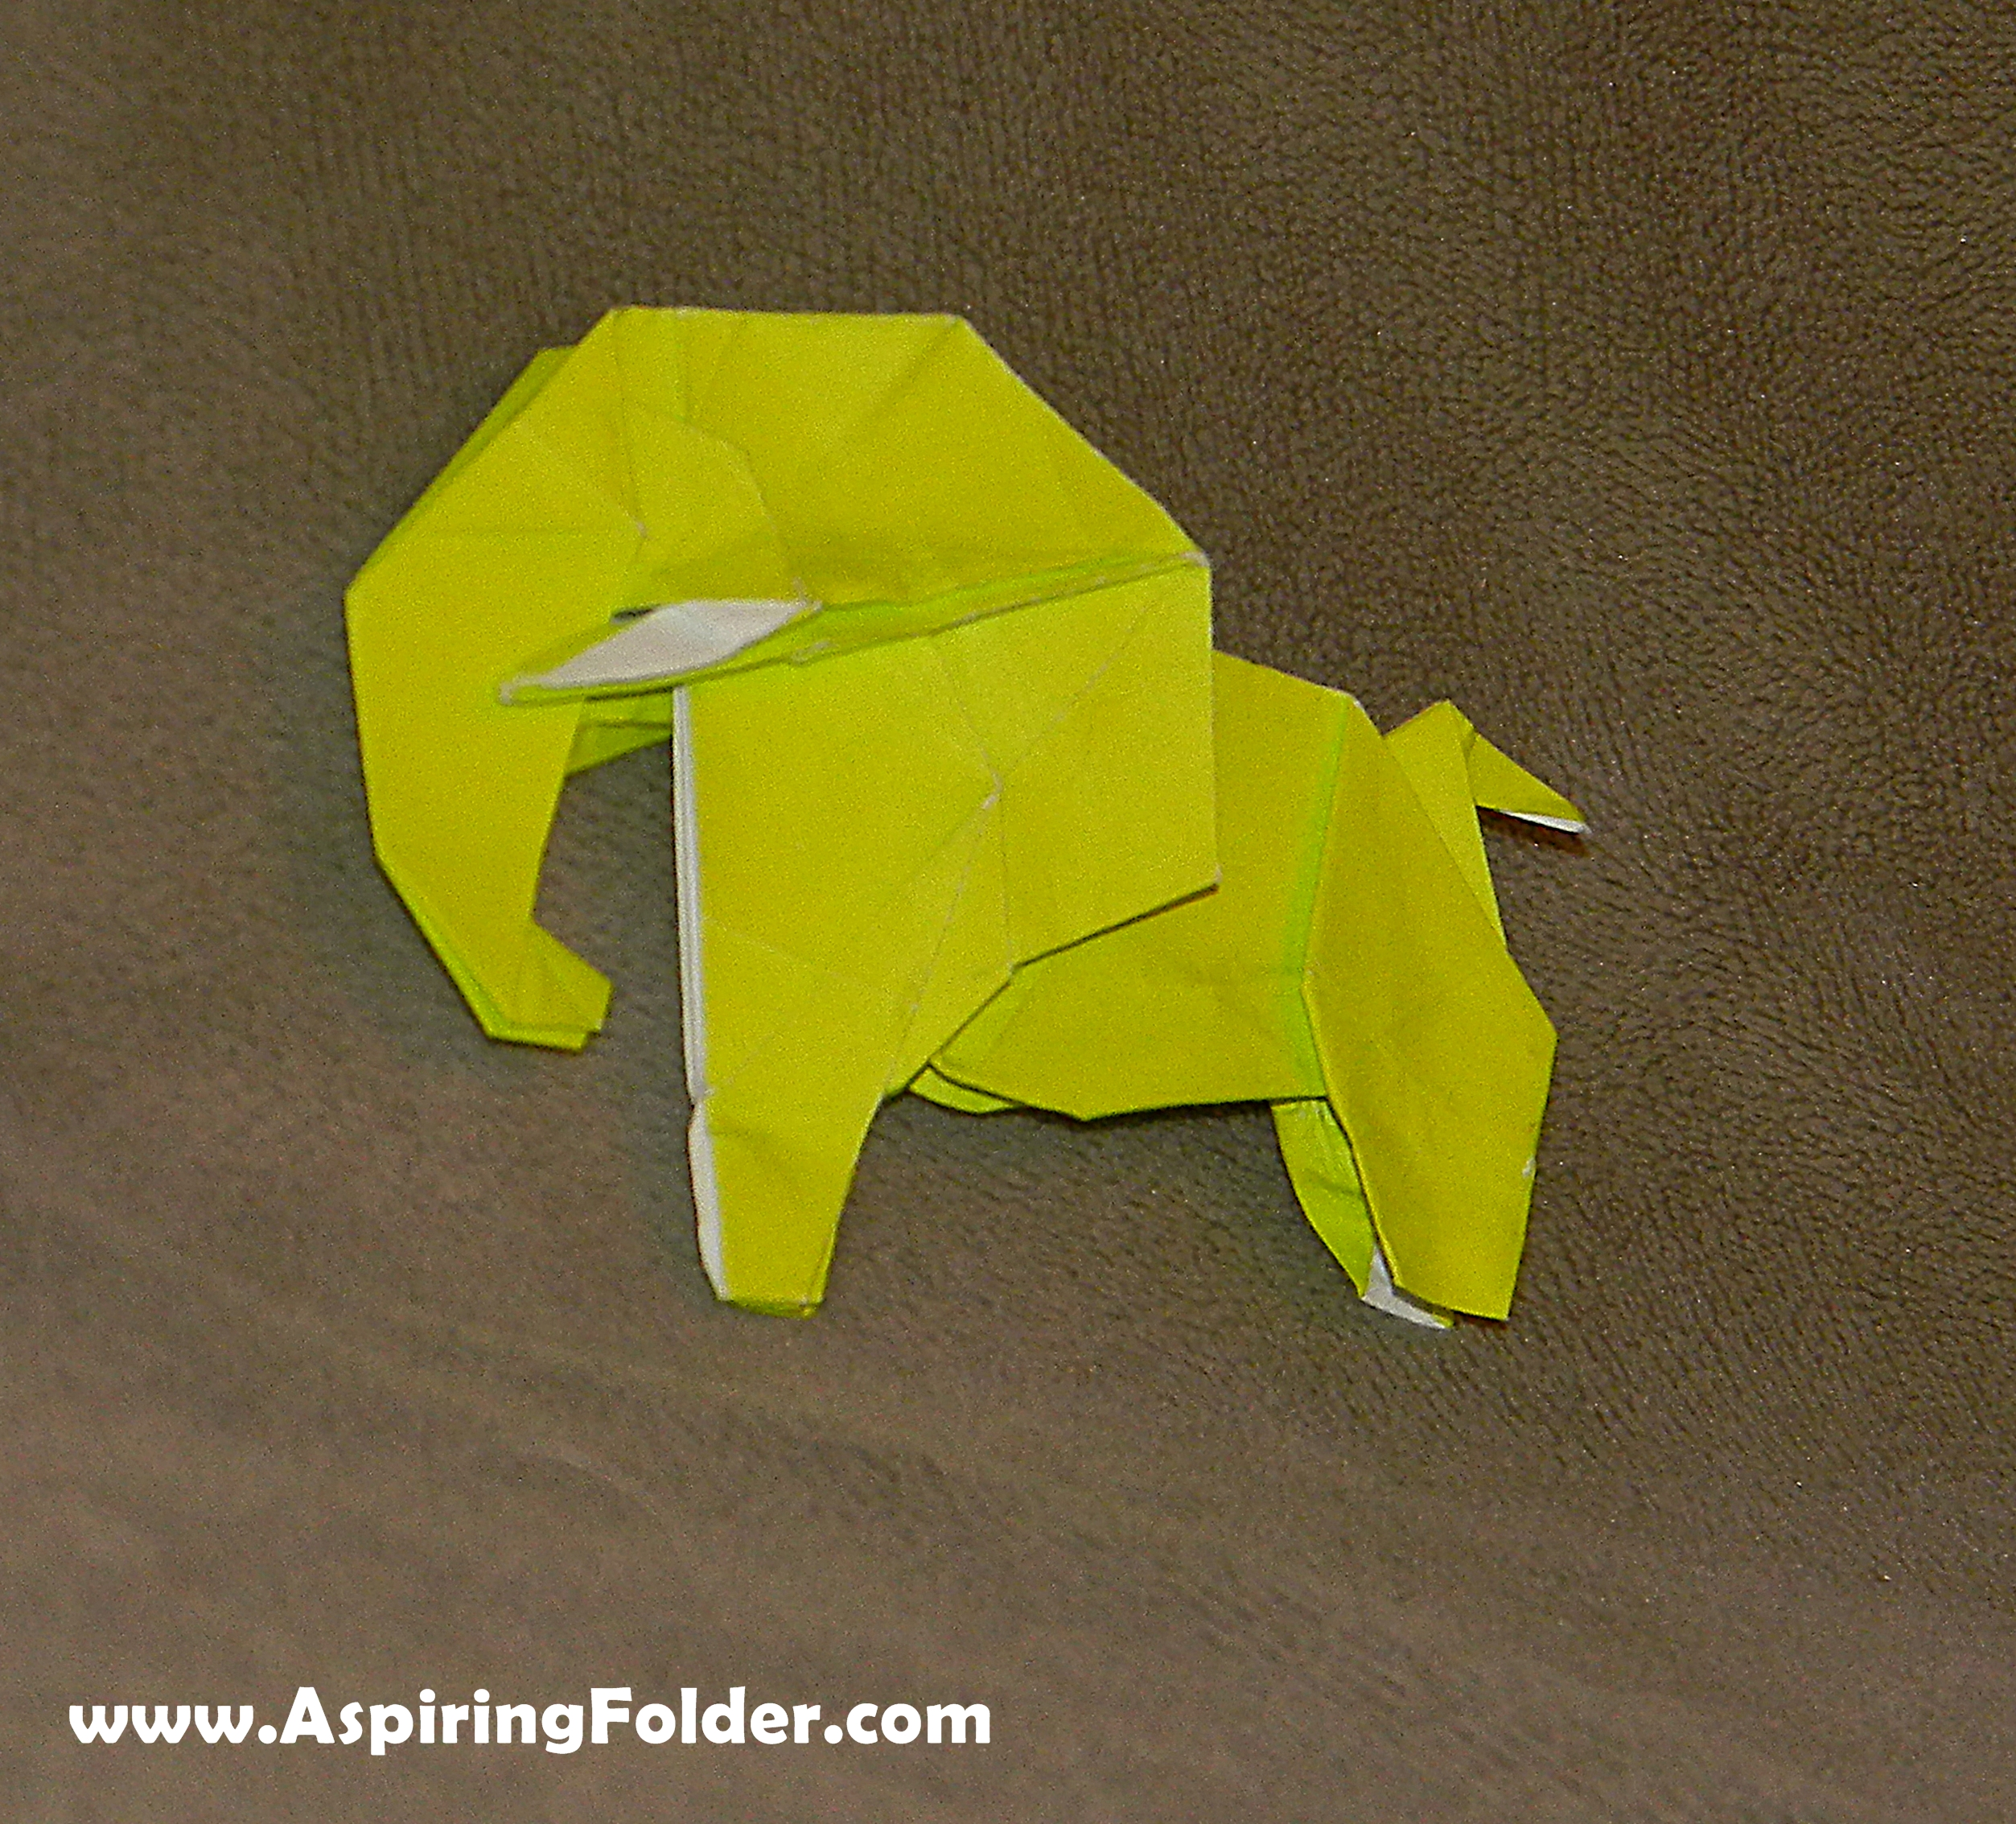 Aspiring Folder | An Origami Blog | Page 2 - photo#44